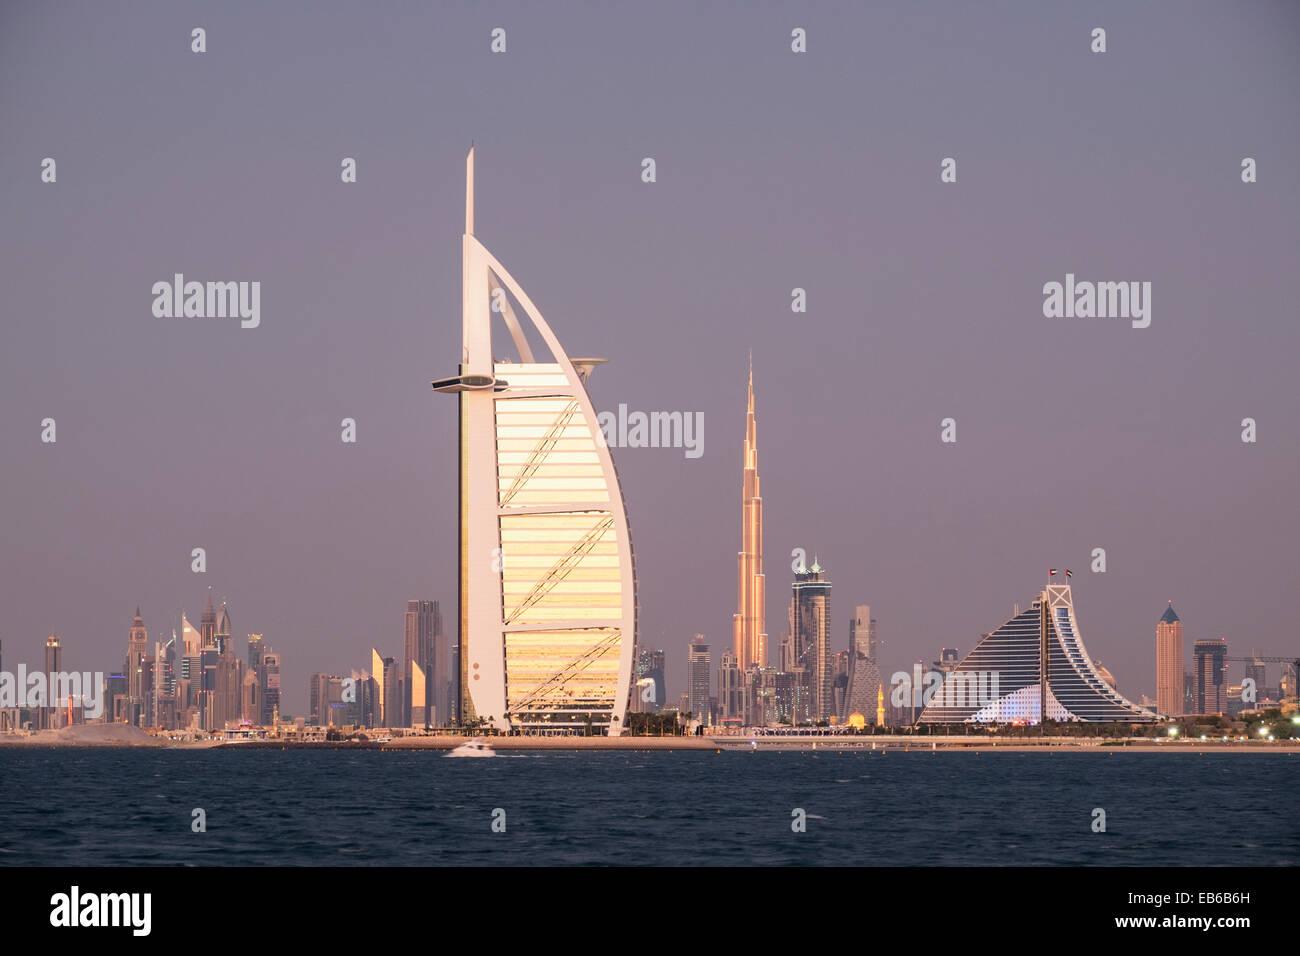 Skyline Of Dubai With Burj Al Arab Hotel And Khalifa Tower In Distance United Emirates